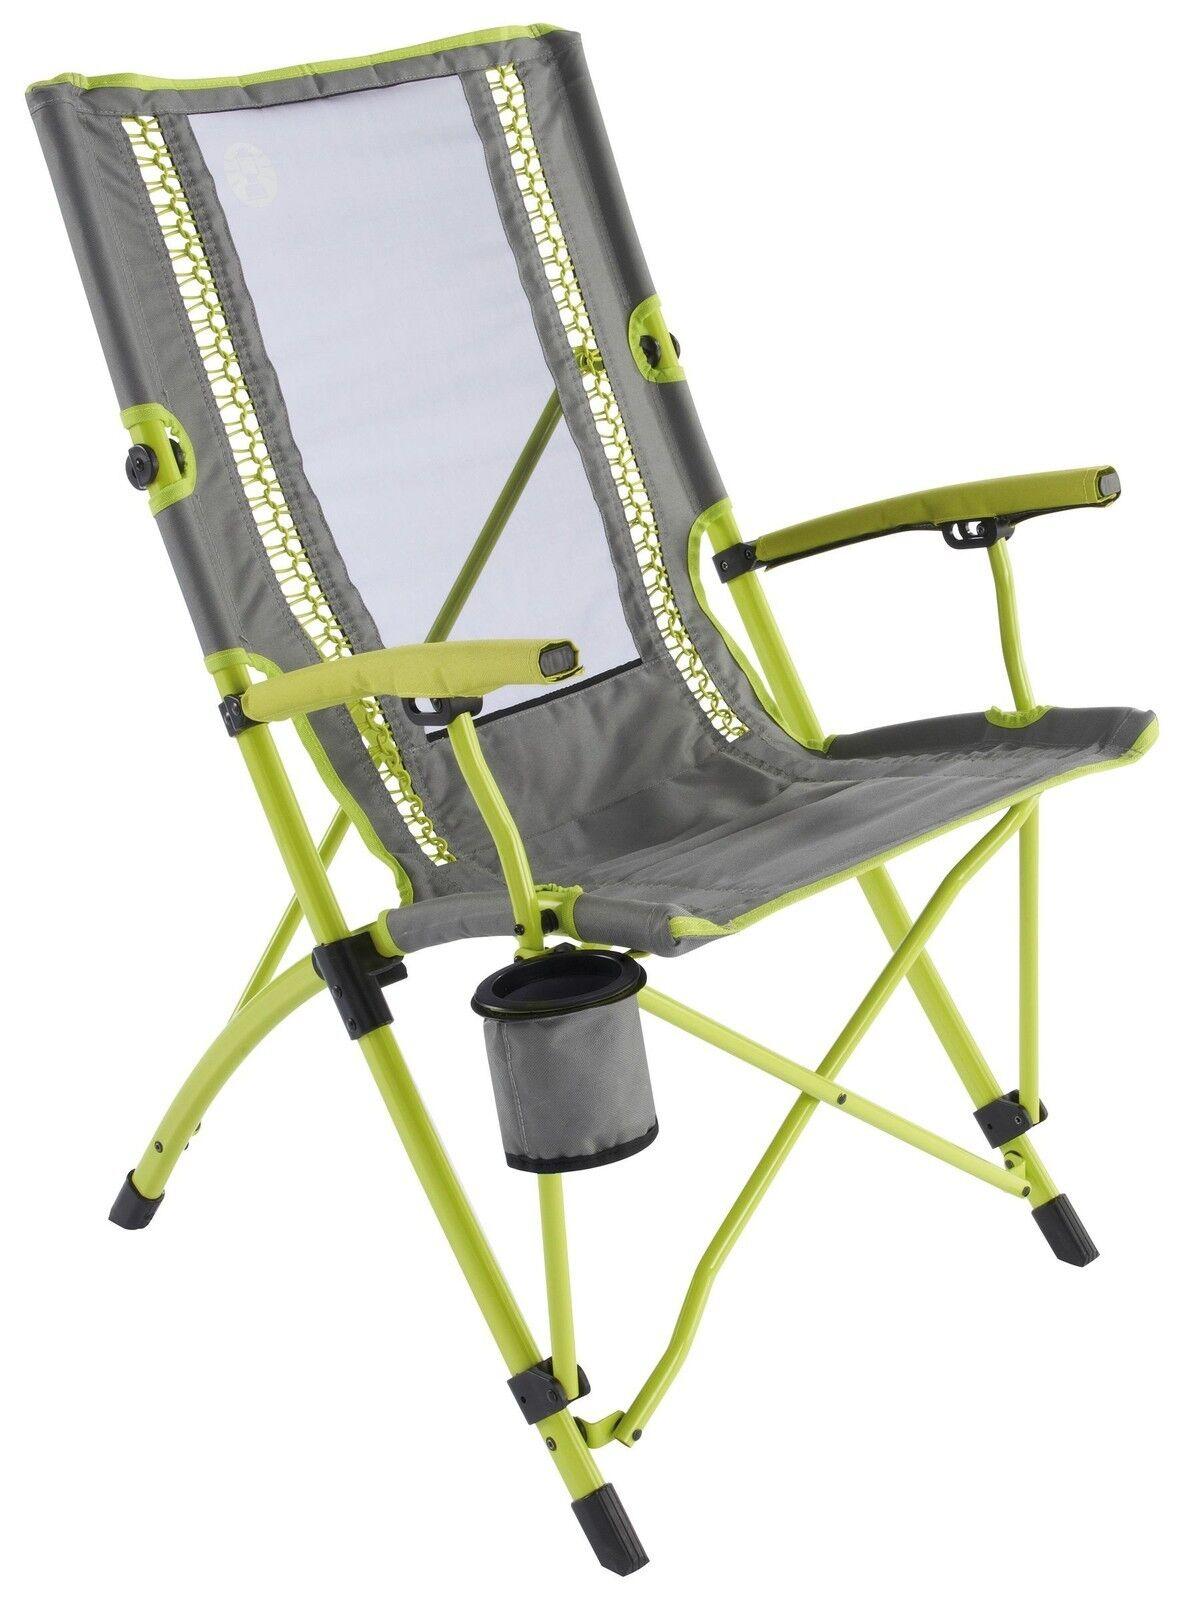 Coleman Coleman Coleman Bungee Chaise Citron Vert Chaise de Camping 2000025548 4da47f